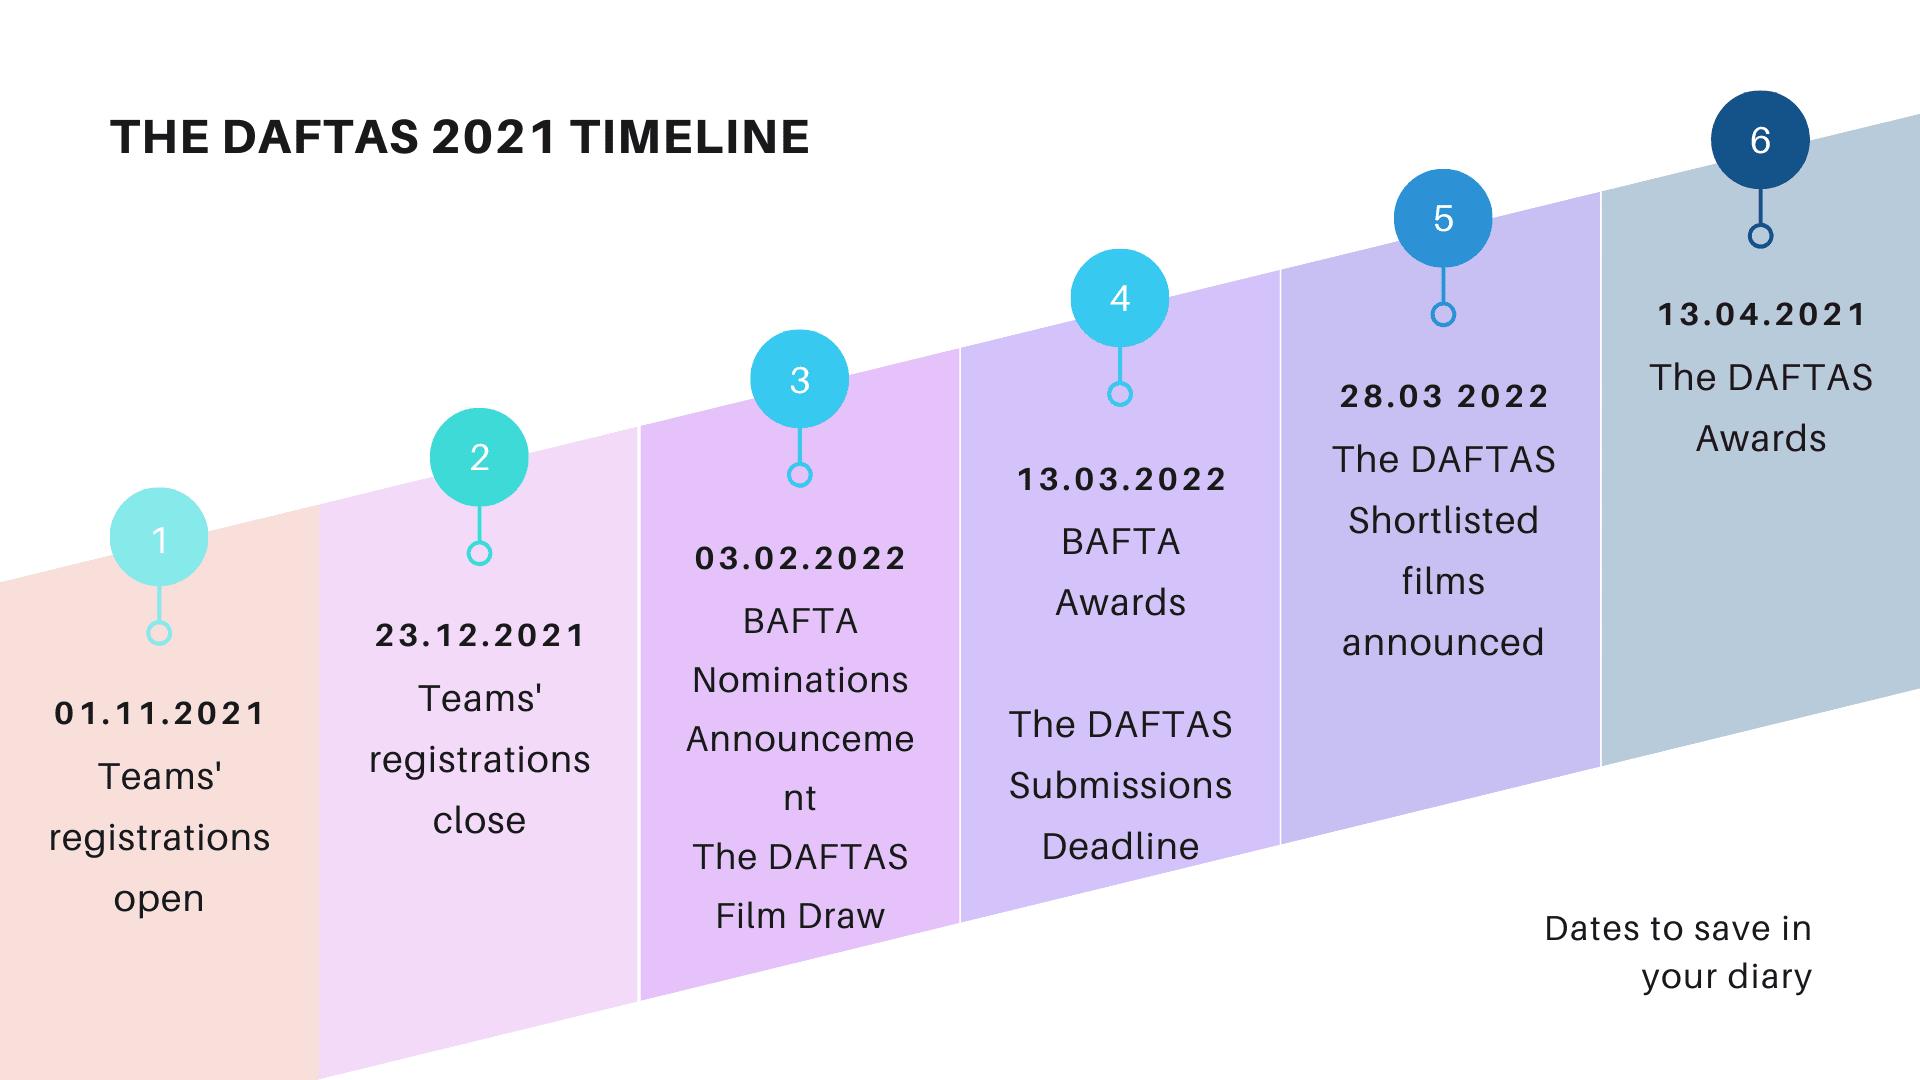 the DAFTAS 2021 TImeline